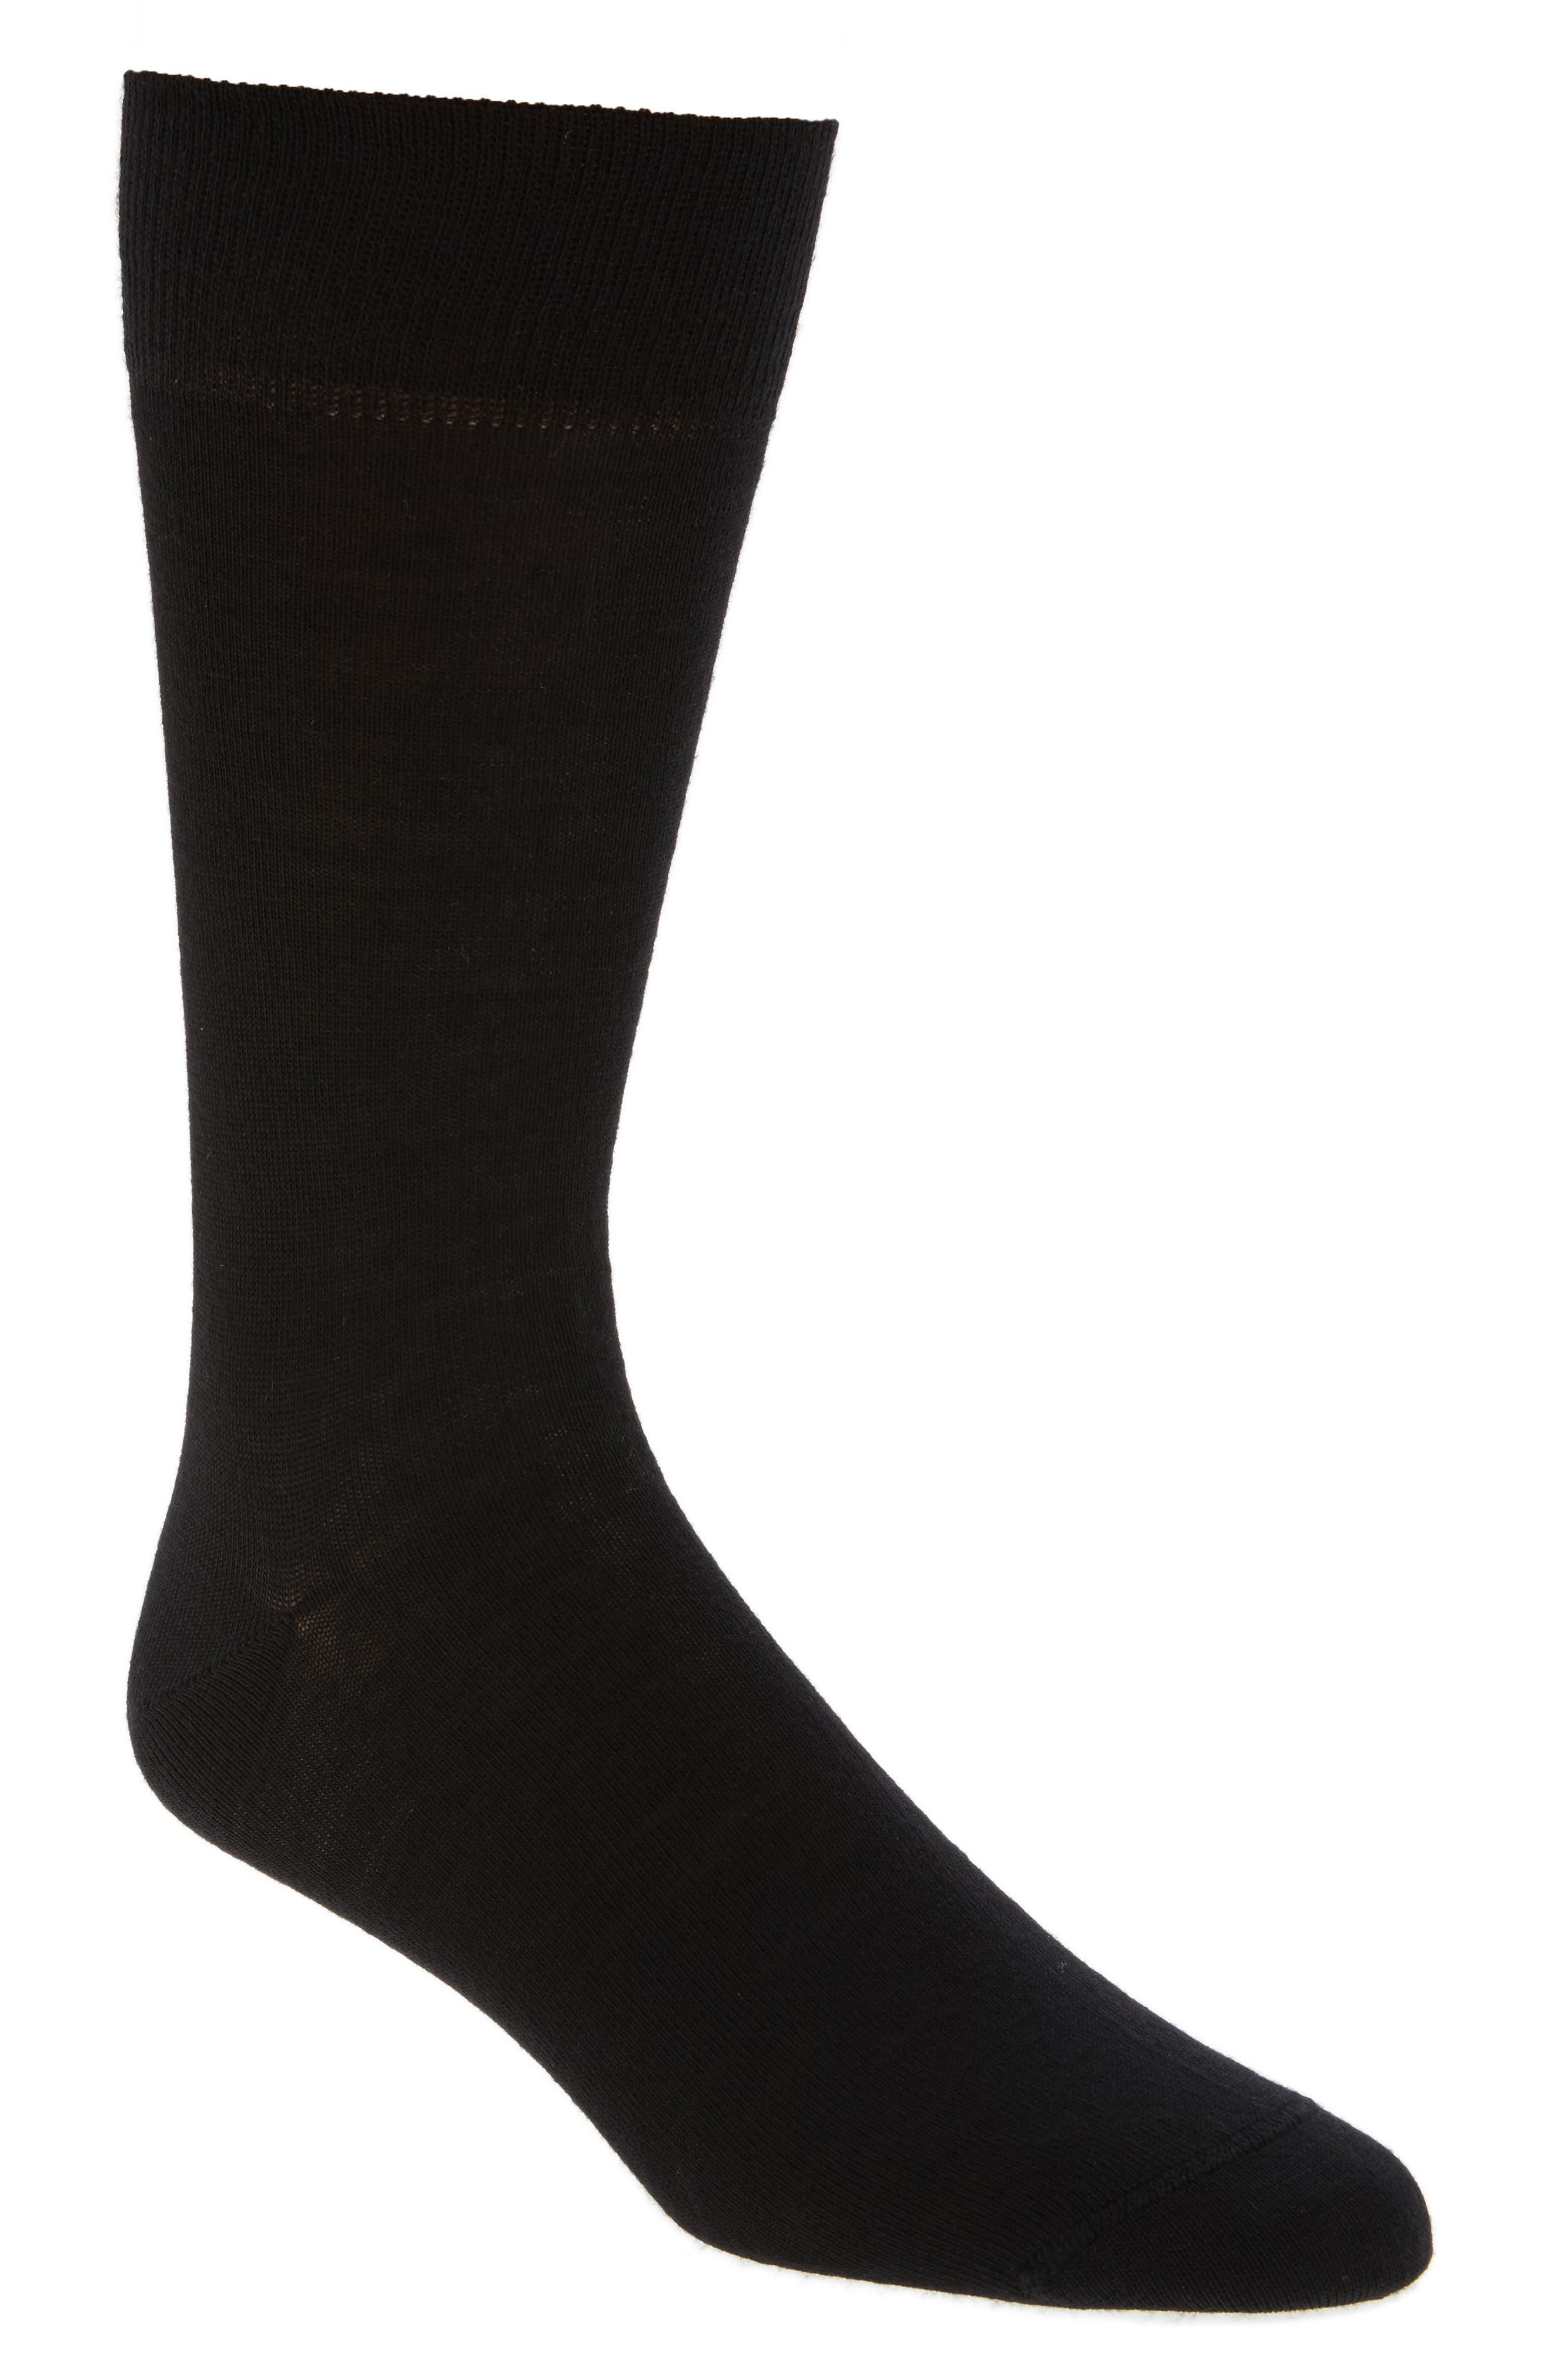 Merino Wool Blend Socks,                             Main thumbnail 1, color,                             001